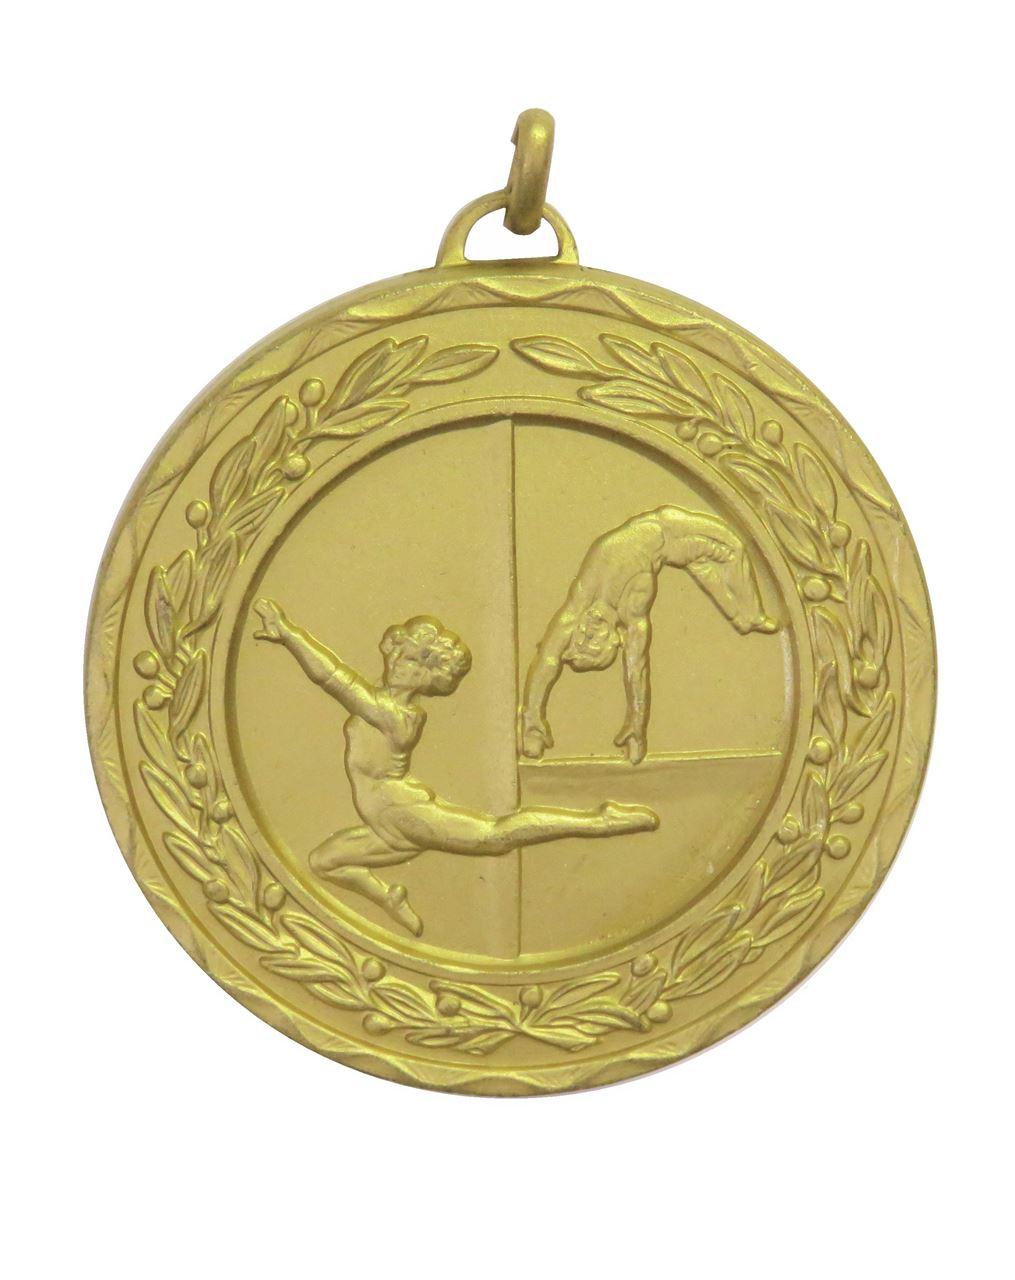 Gold Laurel Economy Gymnastics Medal (size: 50mm) - 4154E